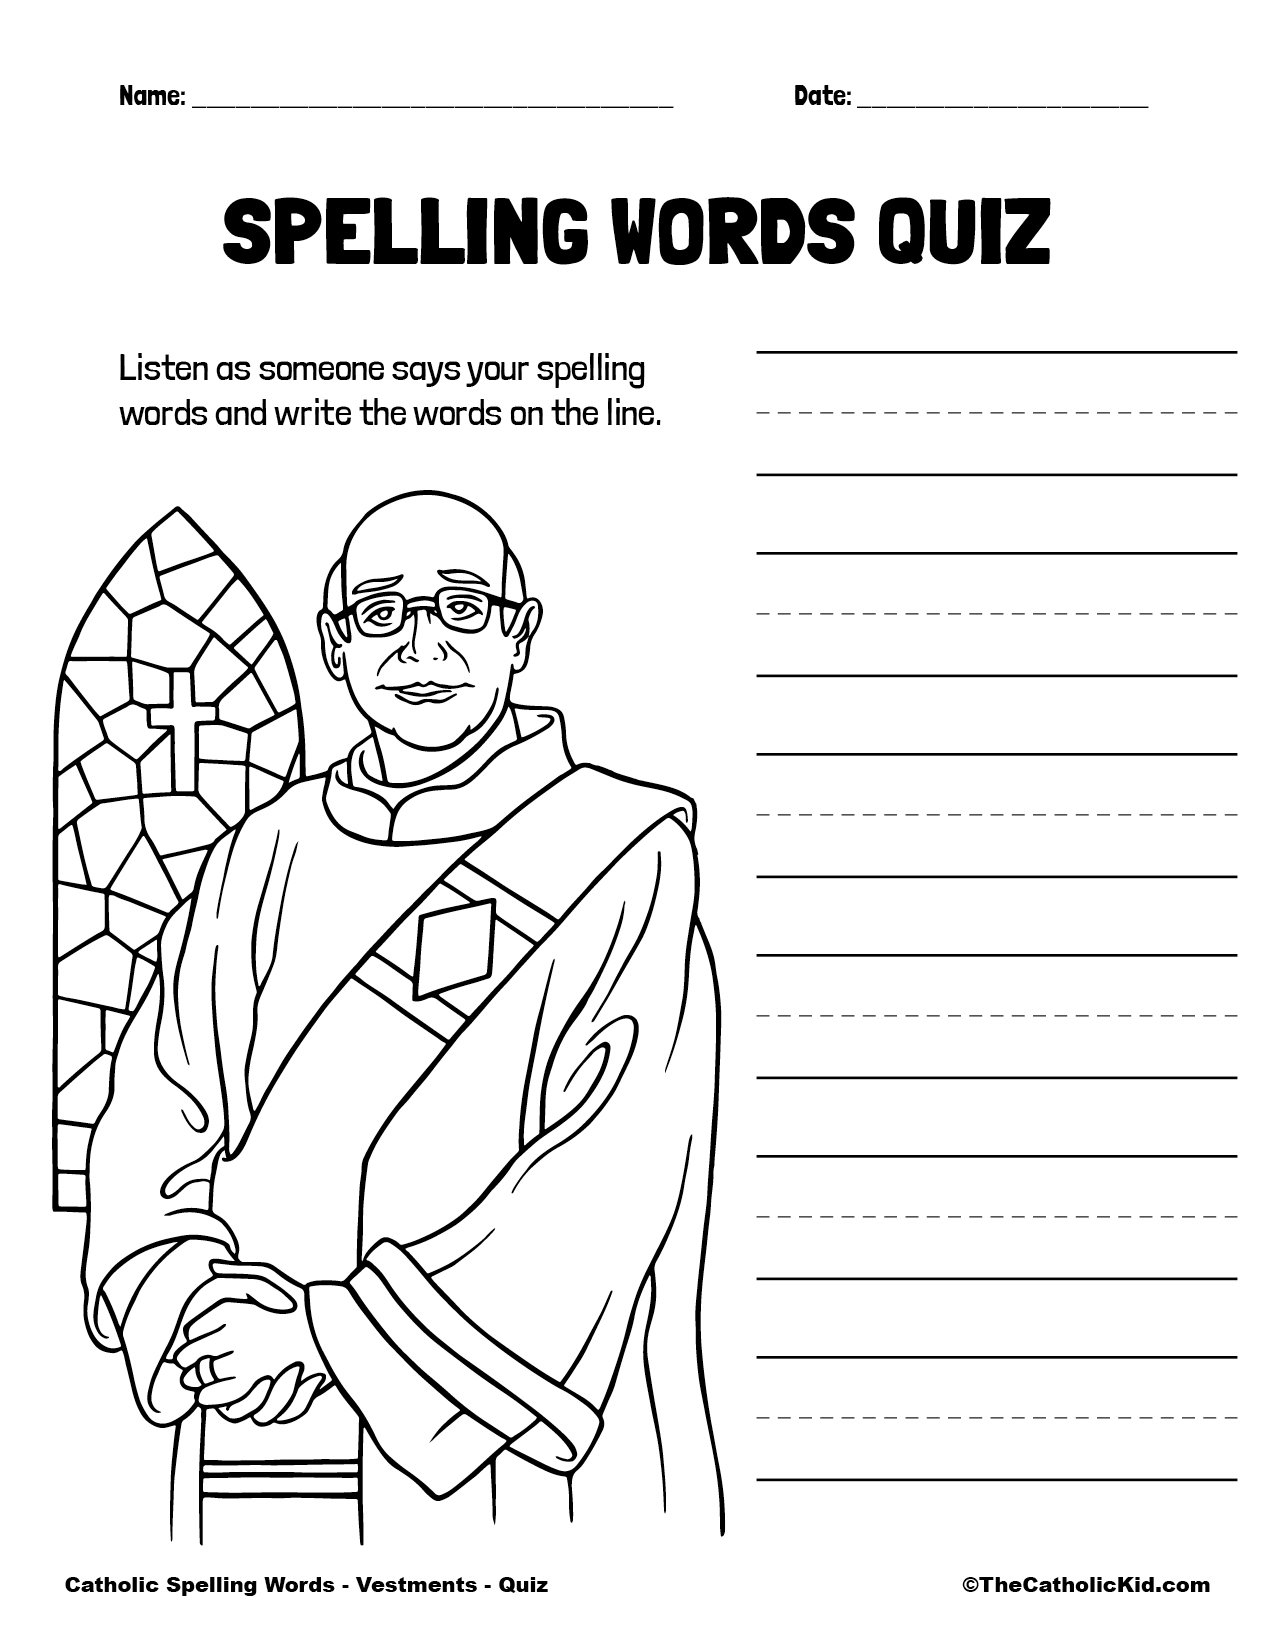 Catholic Spelling & Vocabulary Words Vestments Worksheet 5 Quiz